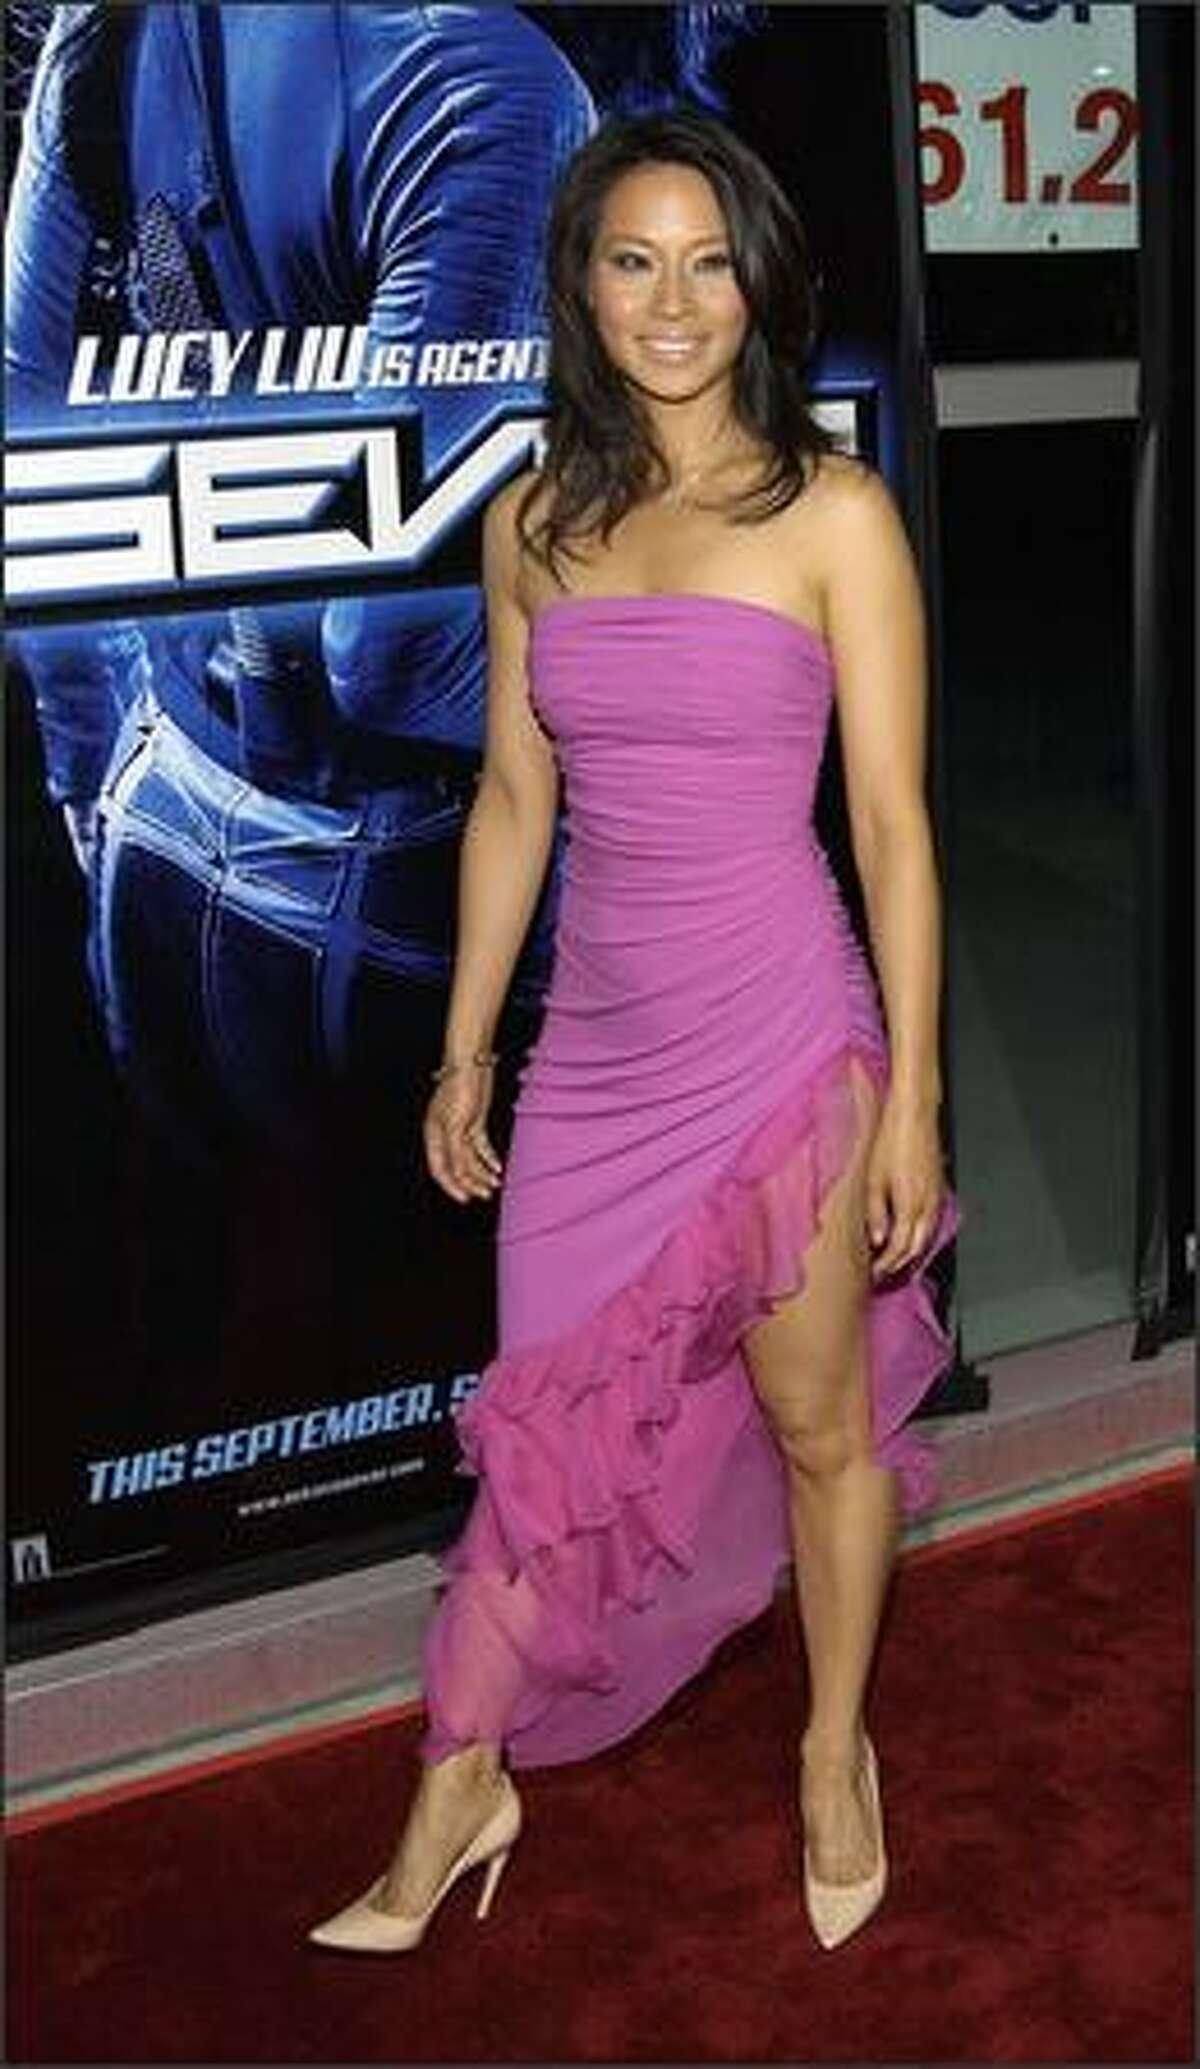 Lucy Liu attends the film premiere of